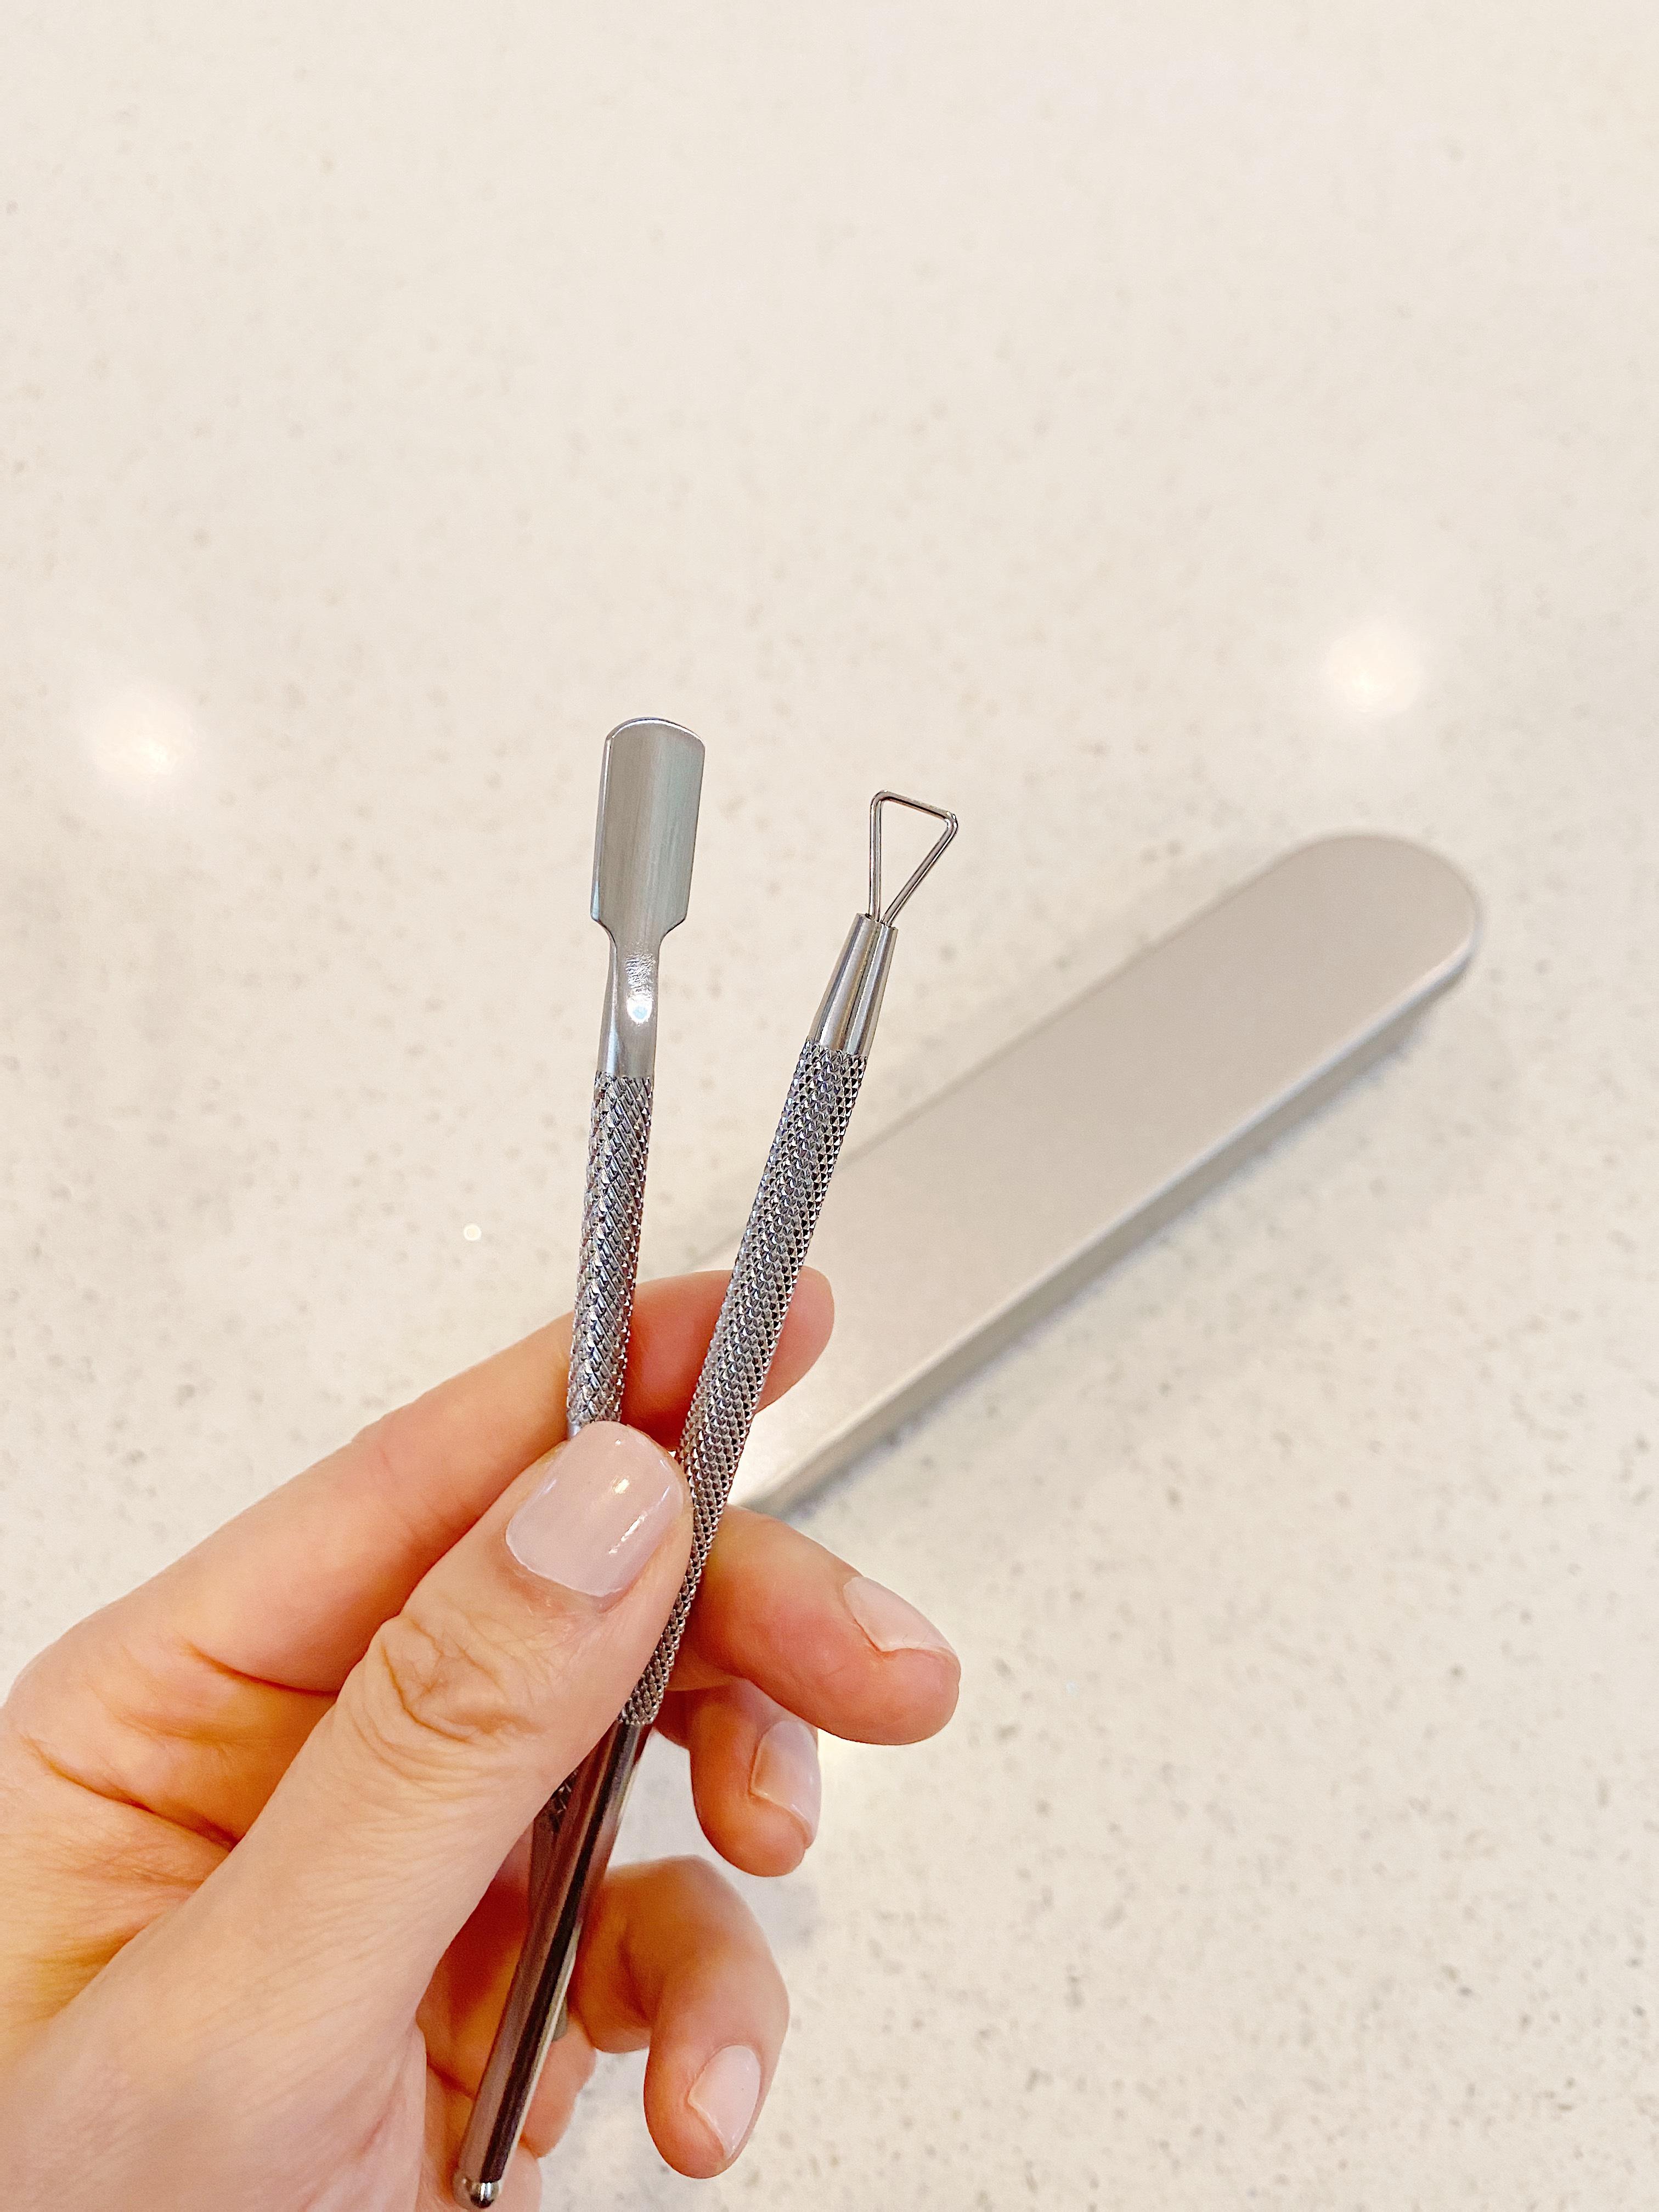 amazon cuticle pusher